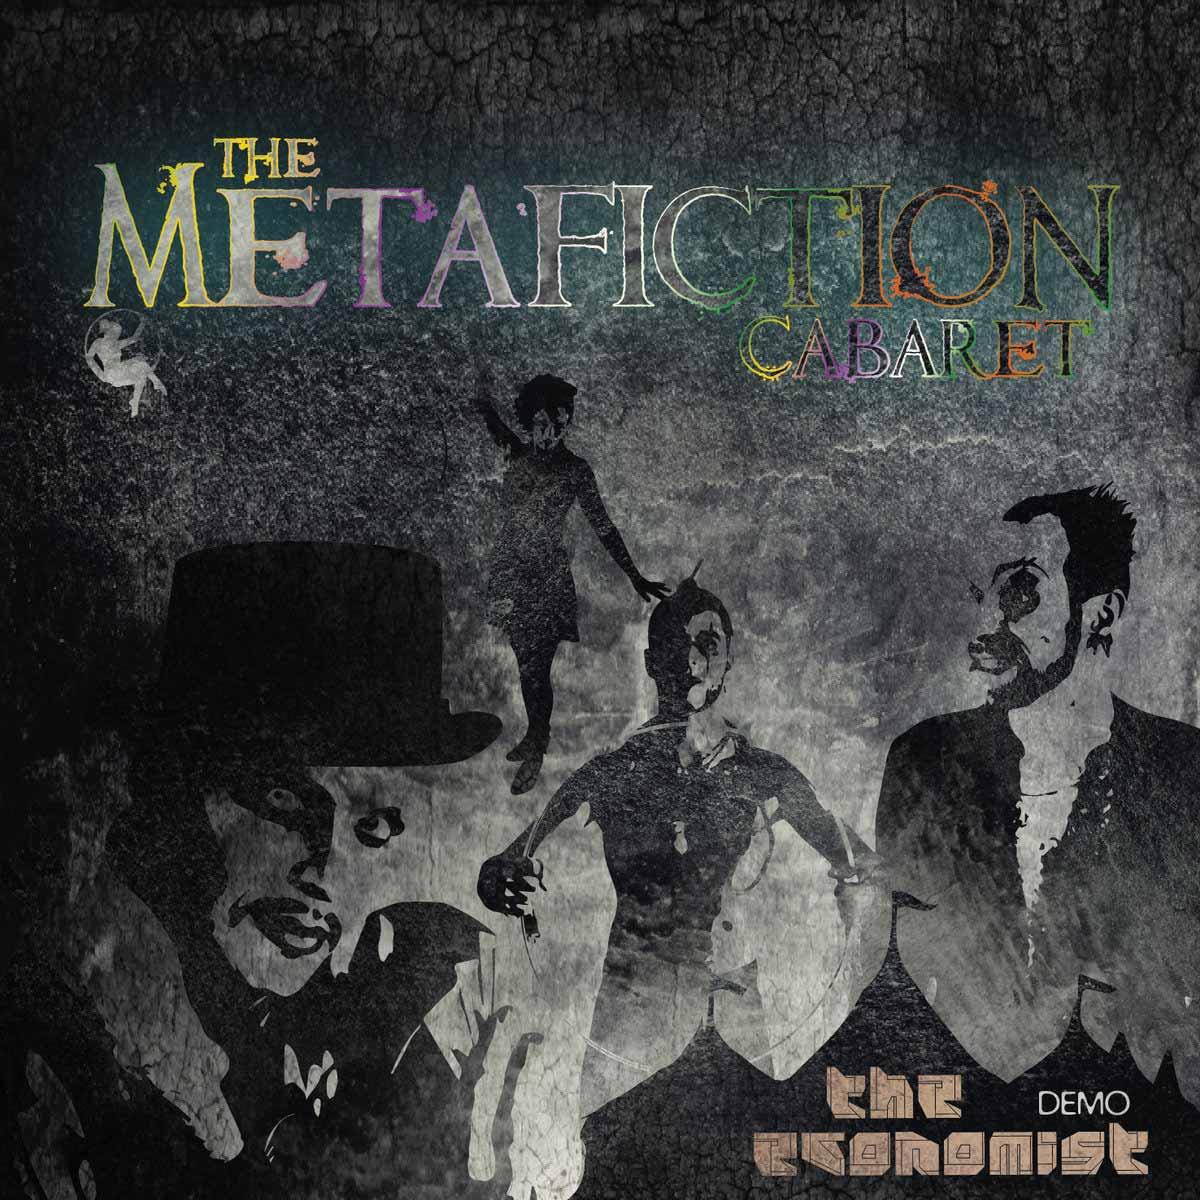 ECONOMIST DEMO COVER - THE METAFICTION CABARET